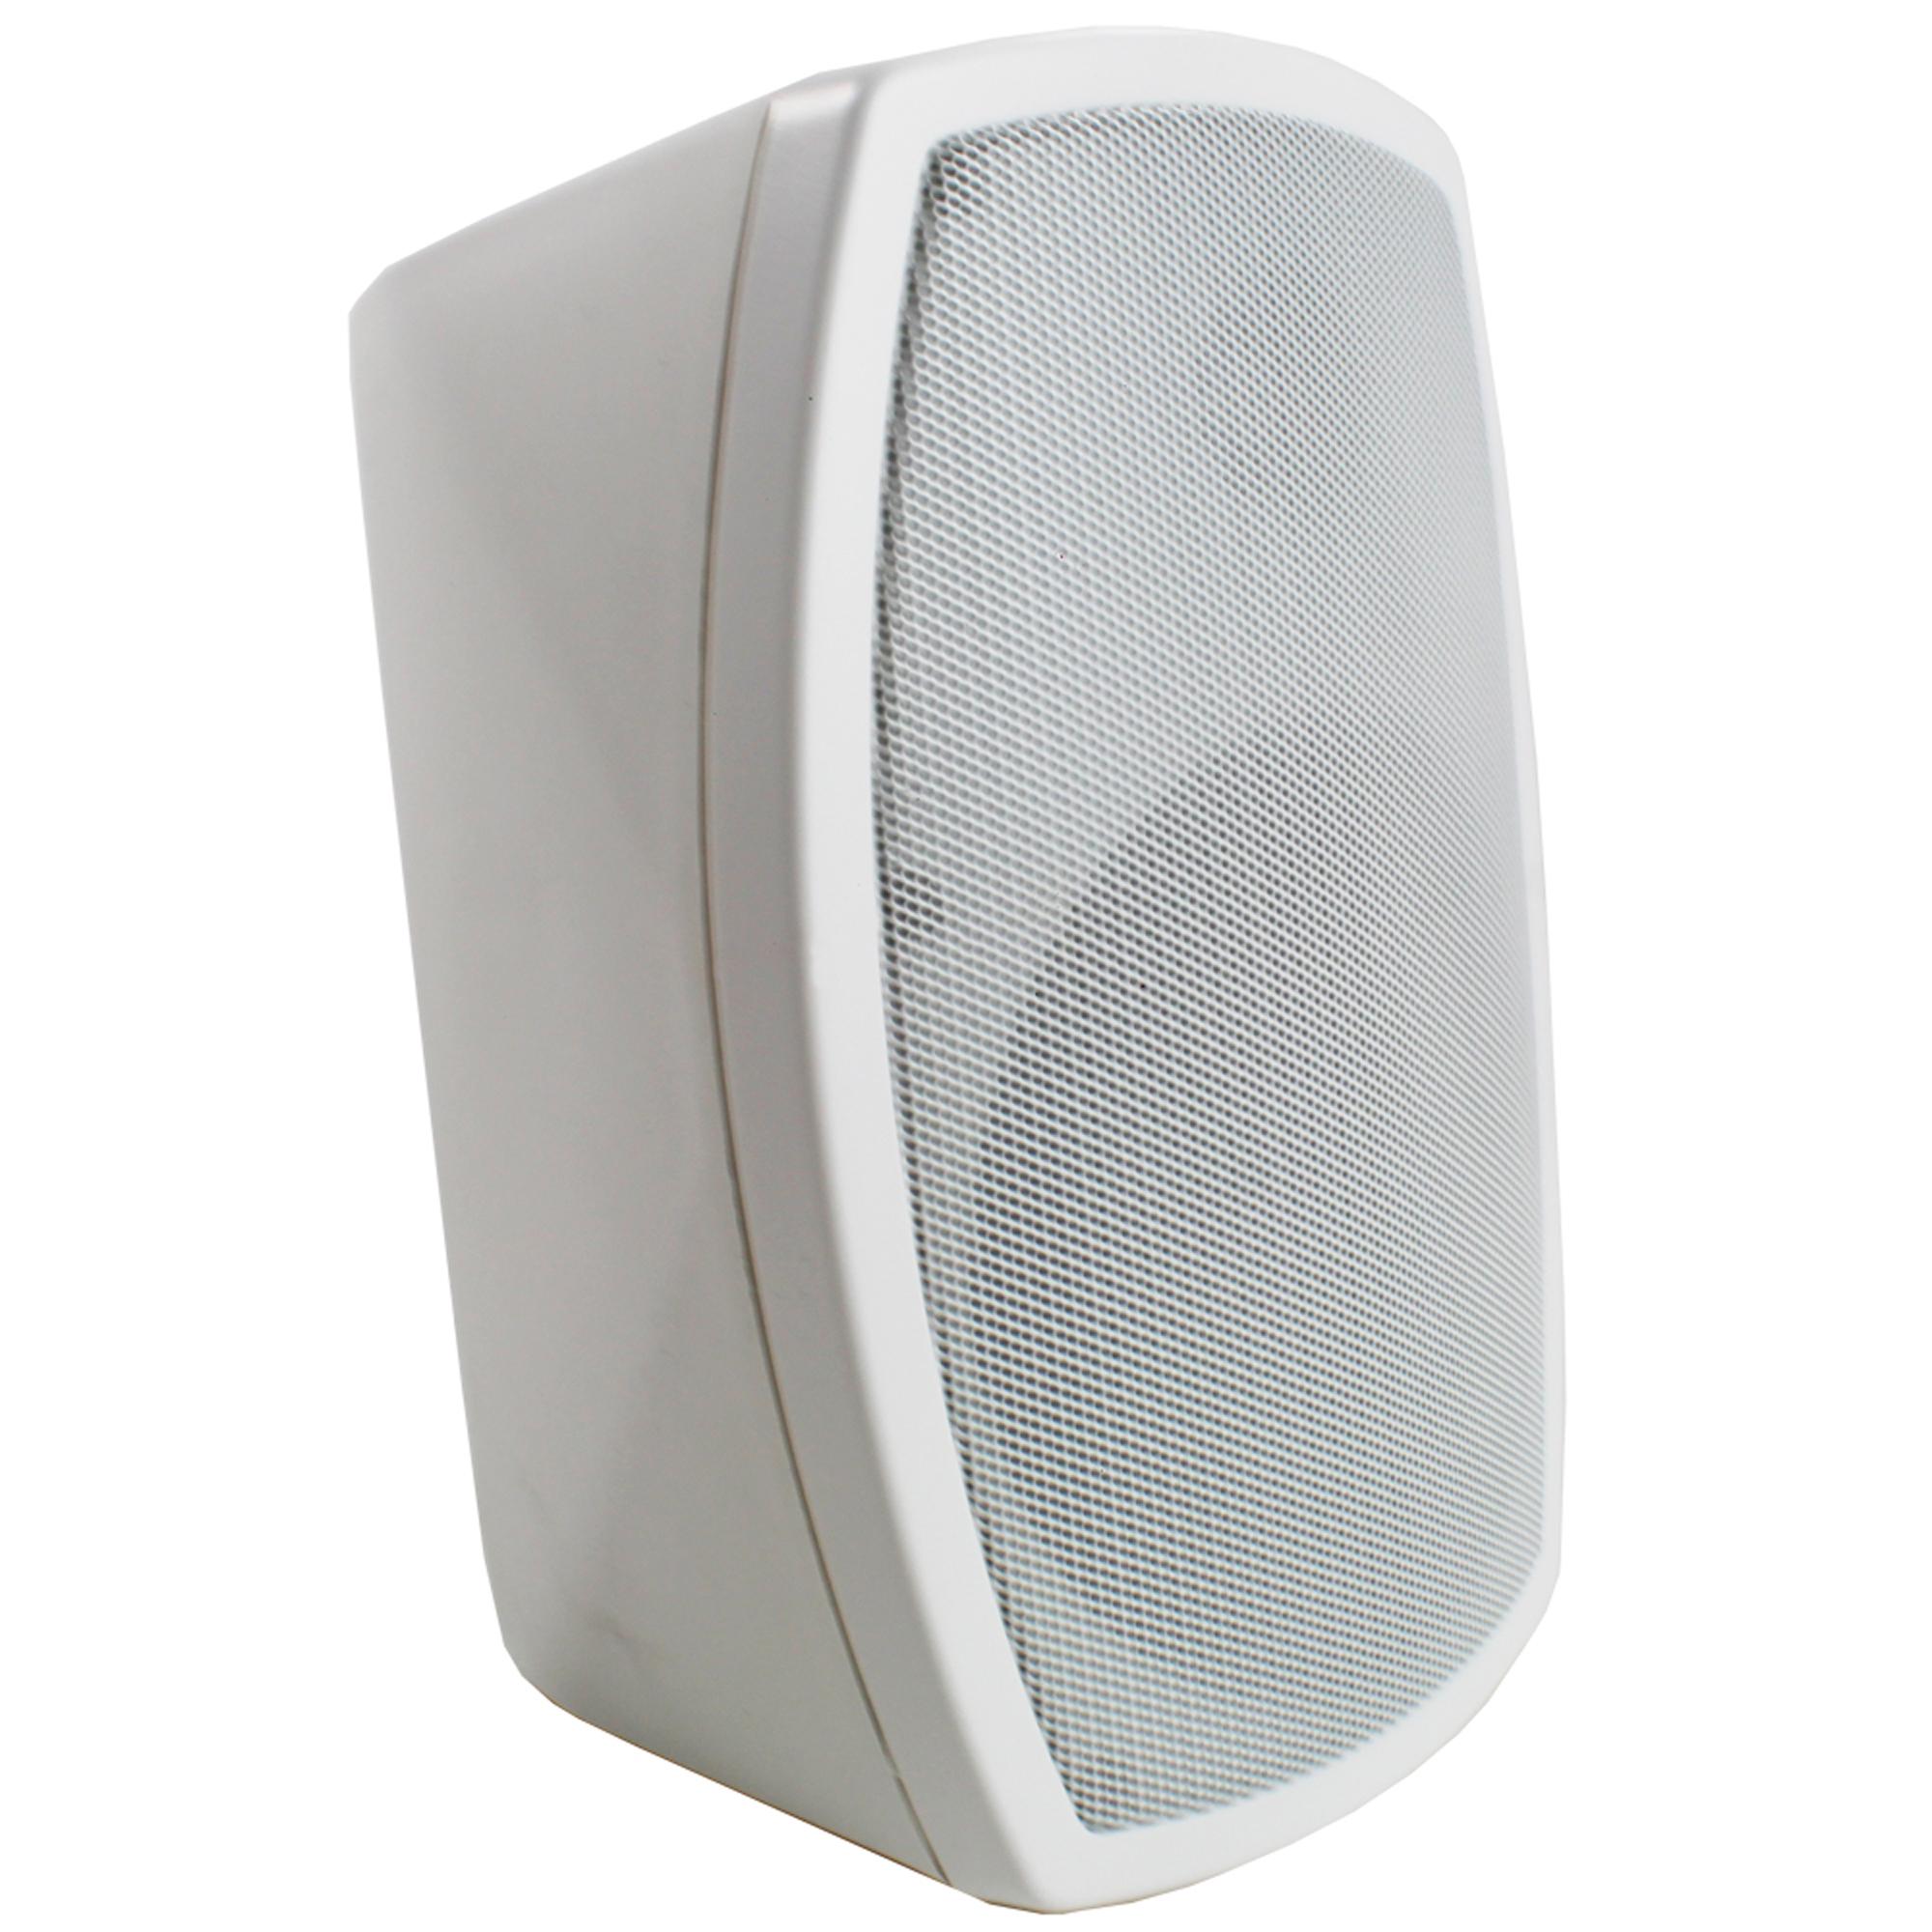 "PD ISPT5W 5"" 100V Wall Speaker"